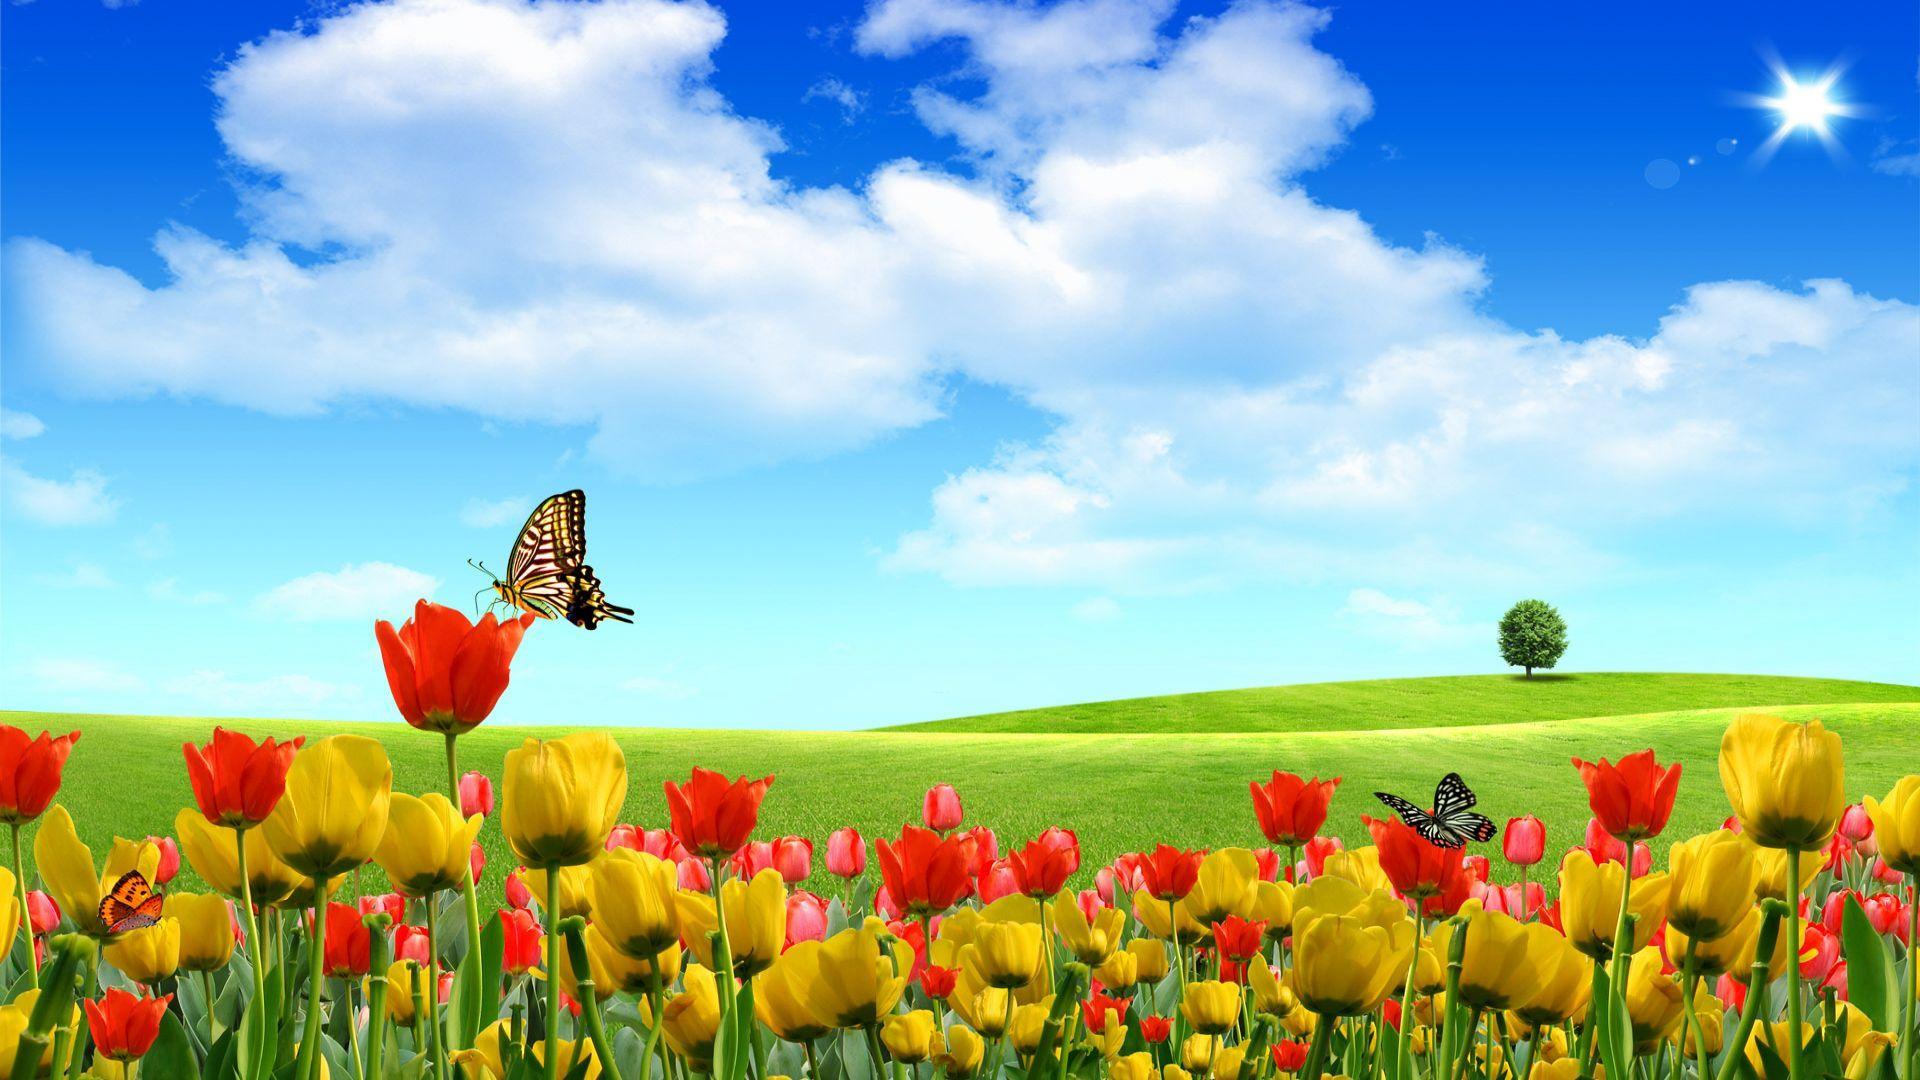 Top Wallpaper High Resolution Scenery - 76c16bf90a0234f9924bafb06127ef82  Trends_448493.jpg